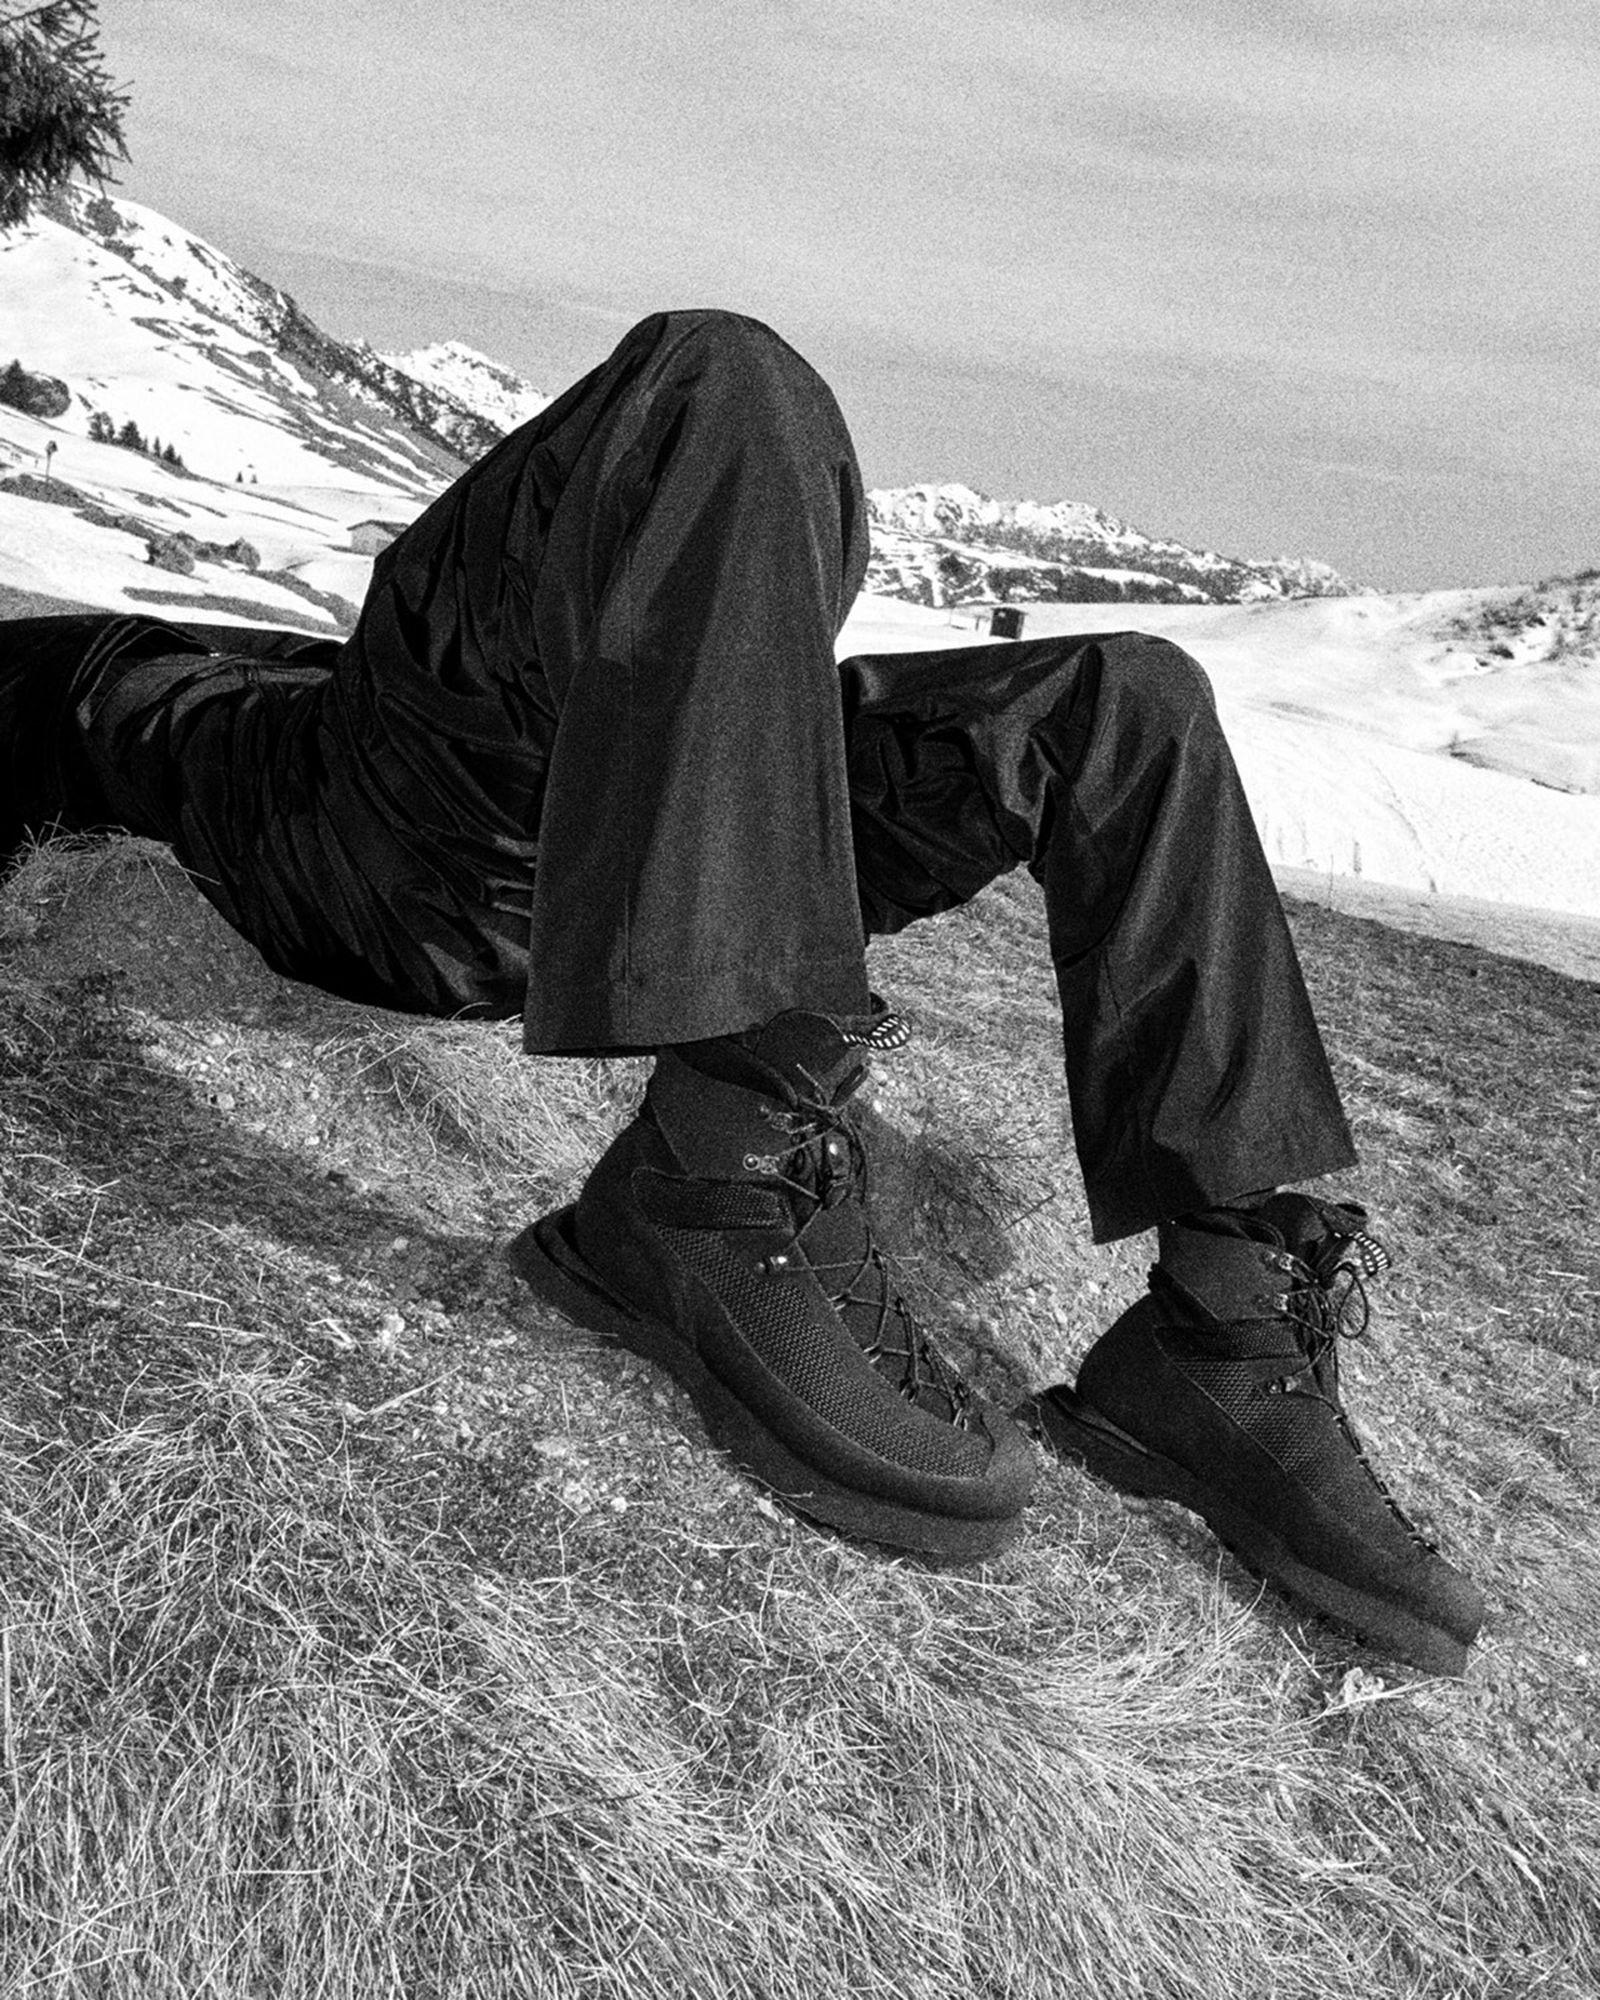 demon-hiking-footwear-interview-10